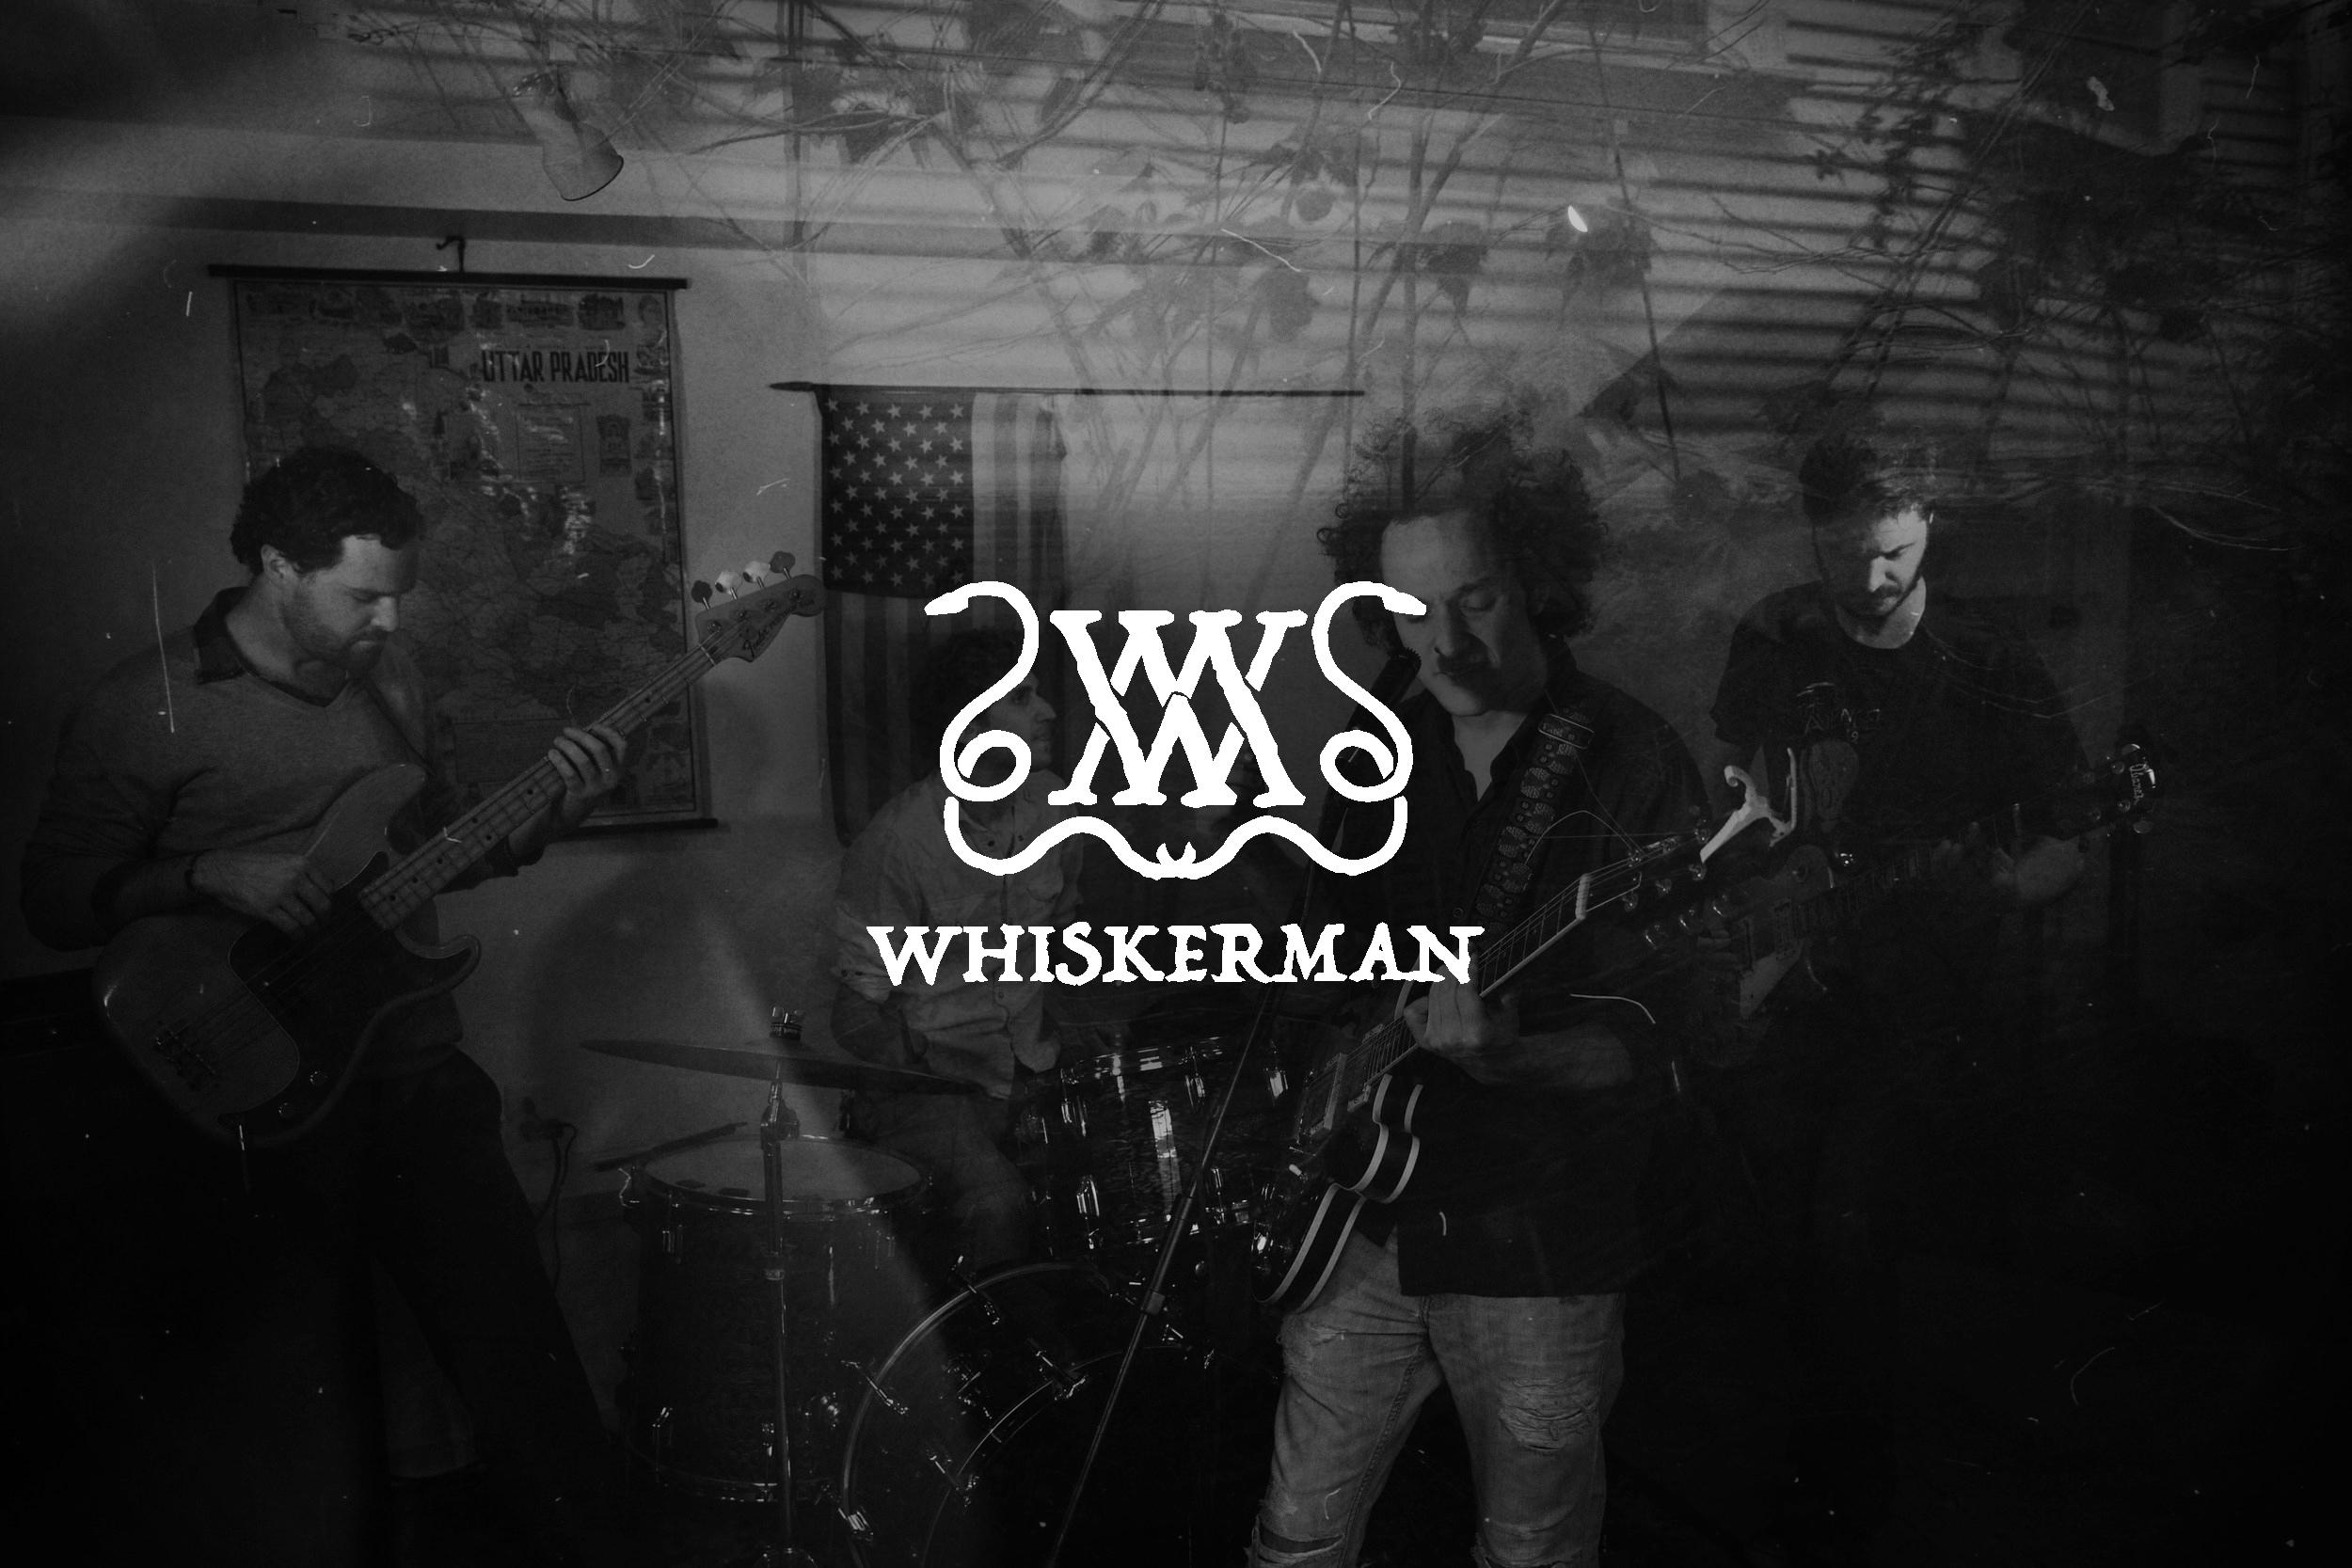 Whiskerman